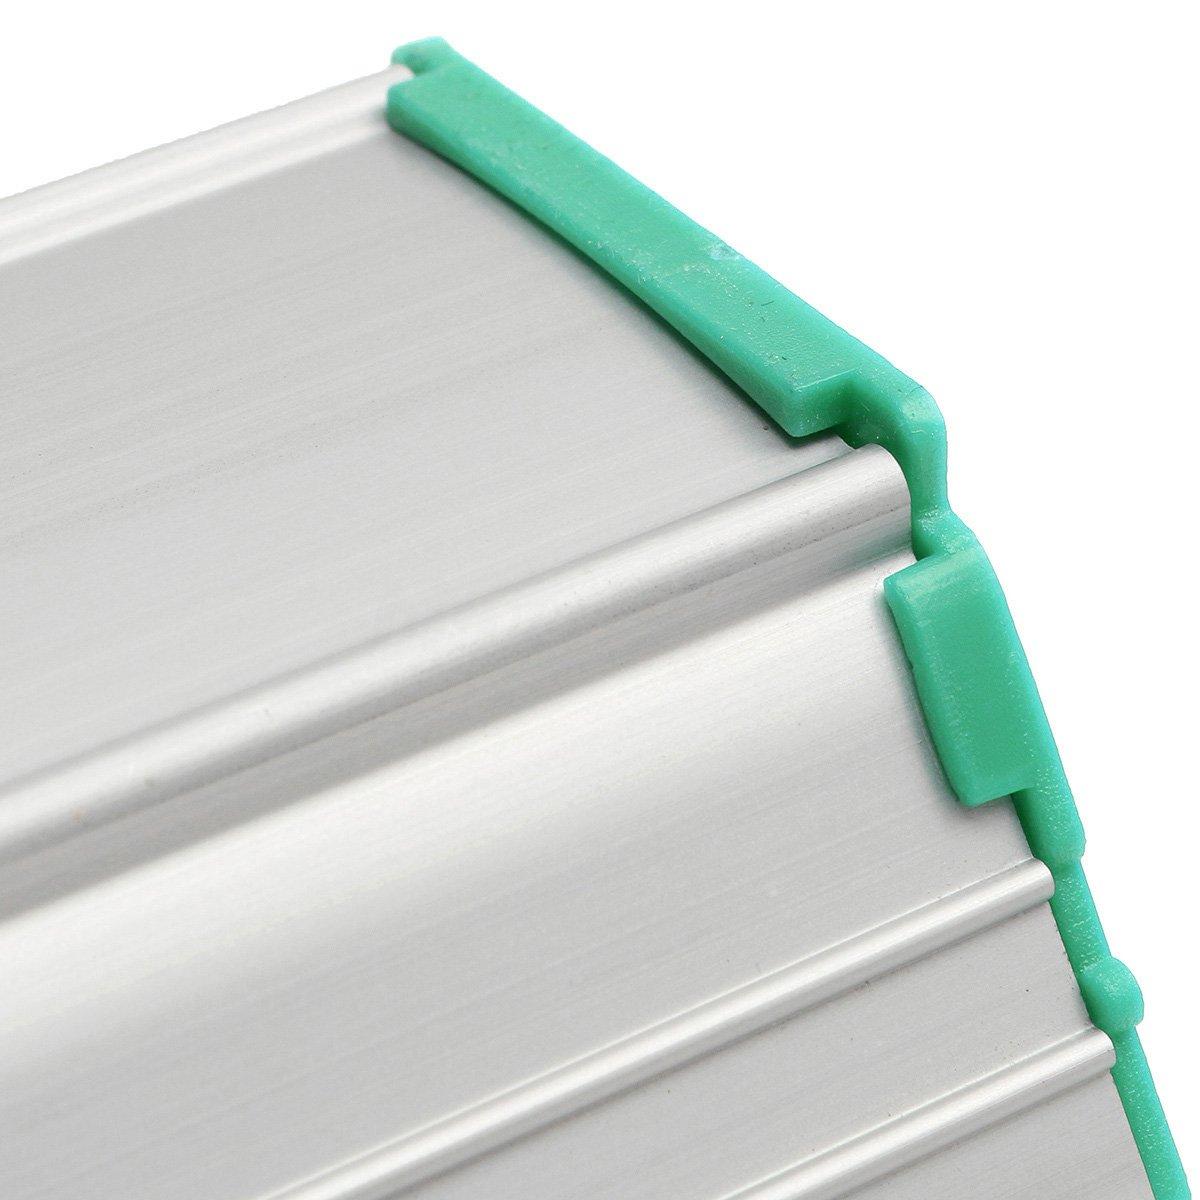 SNOWINSPRING 1PC Aluminum Alloy 8 inch 20CM Emulsion Scoop Coater Silk Screen Printing Press Tool